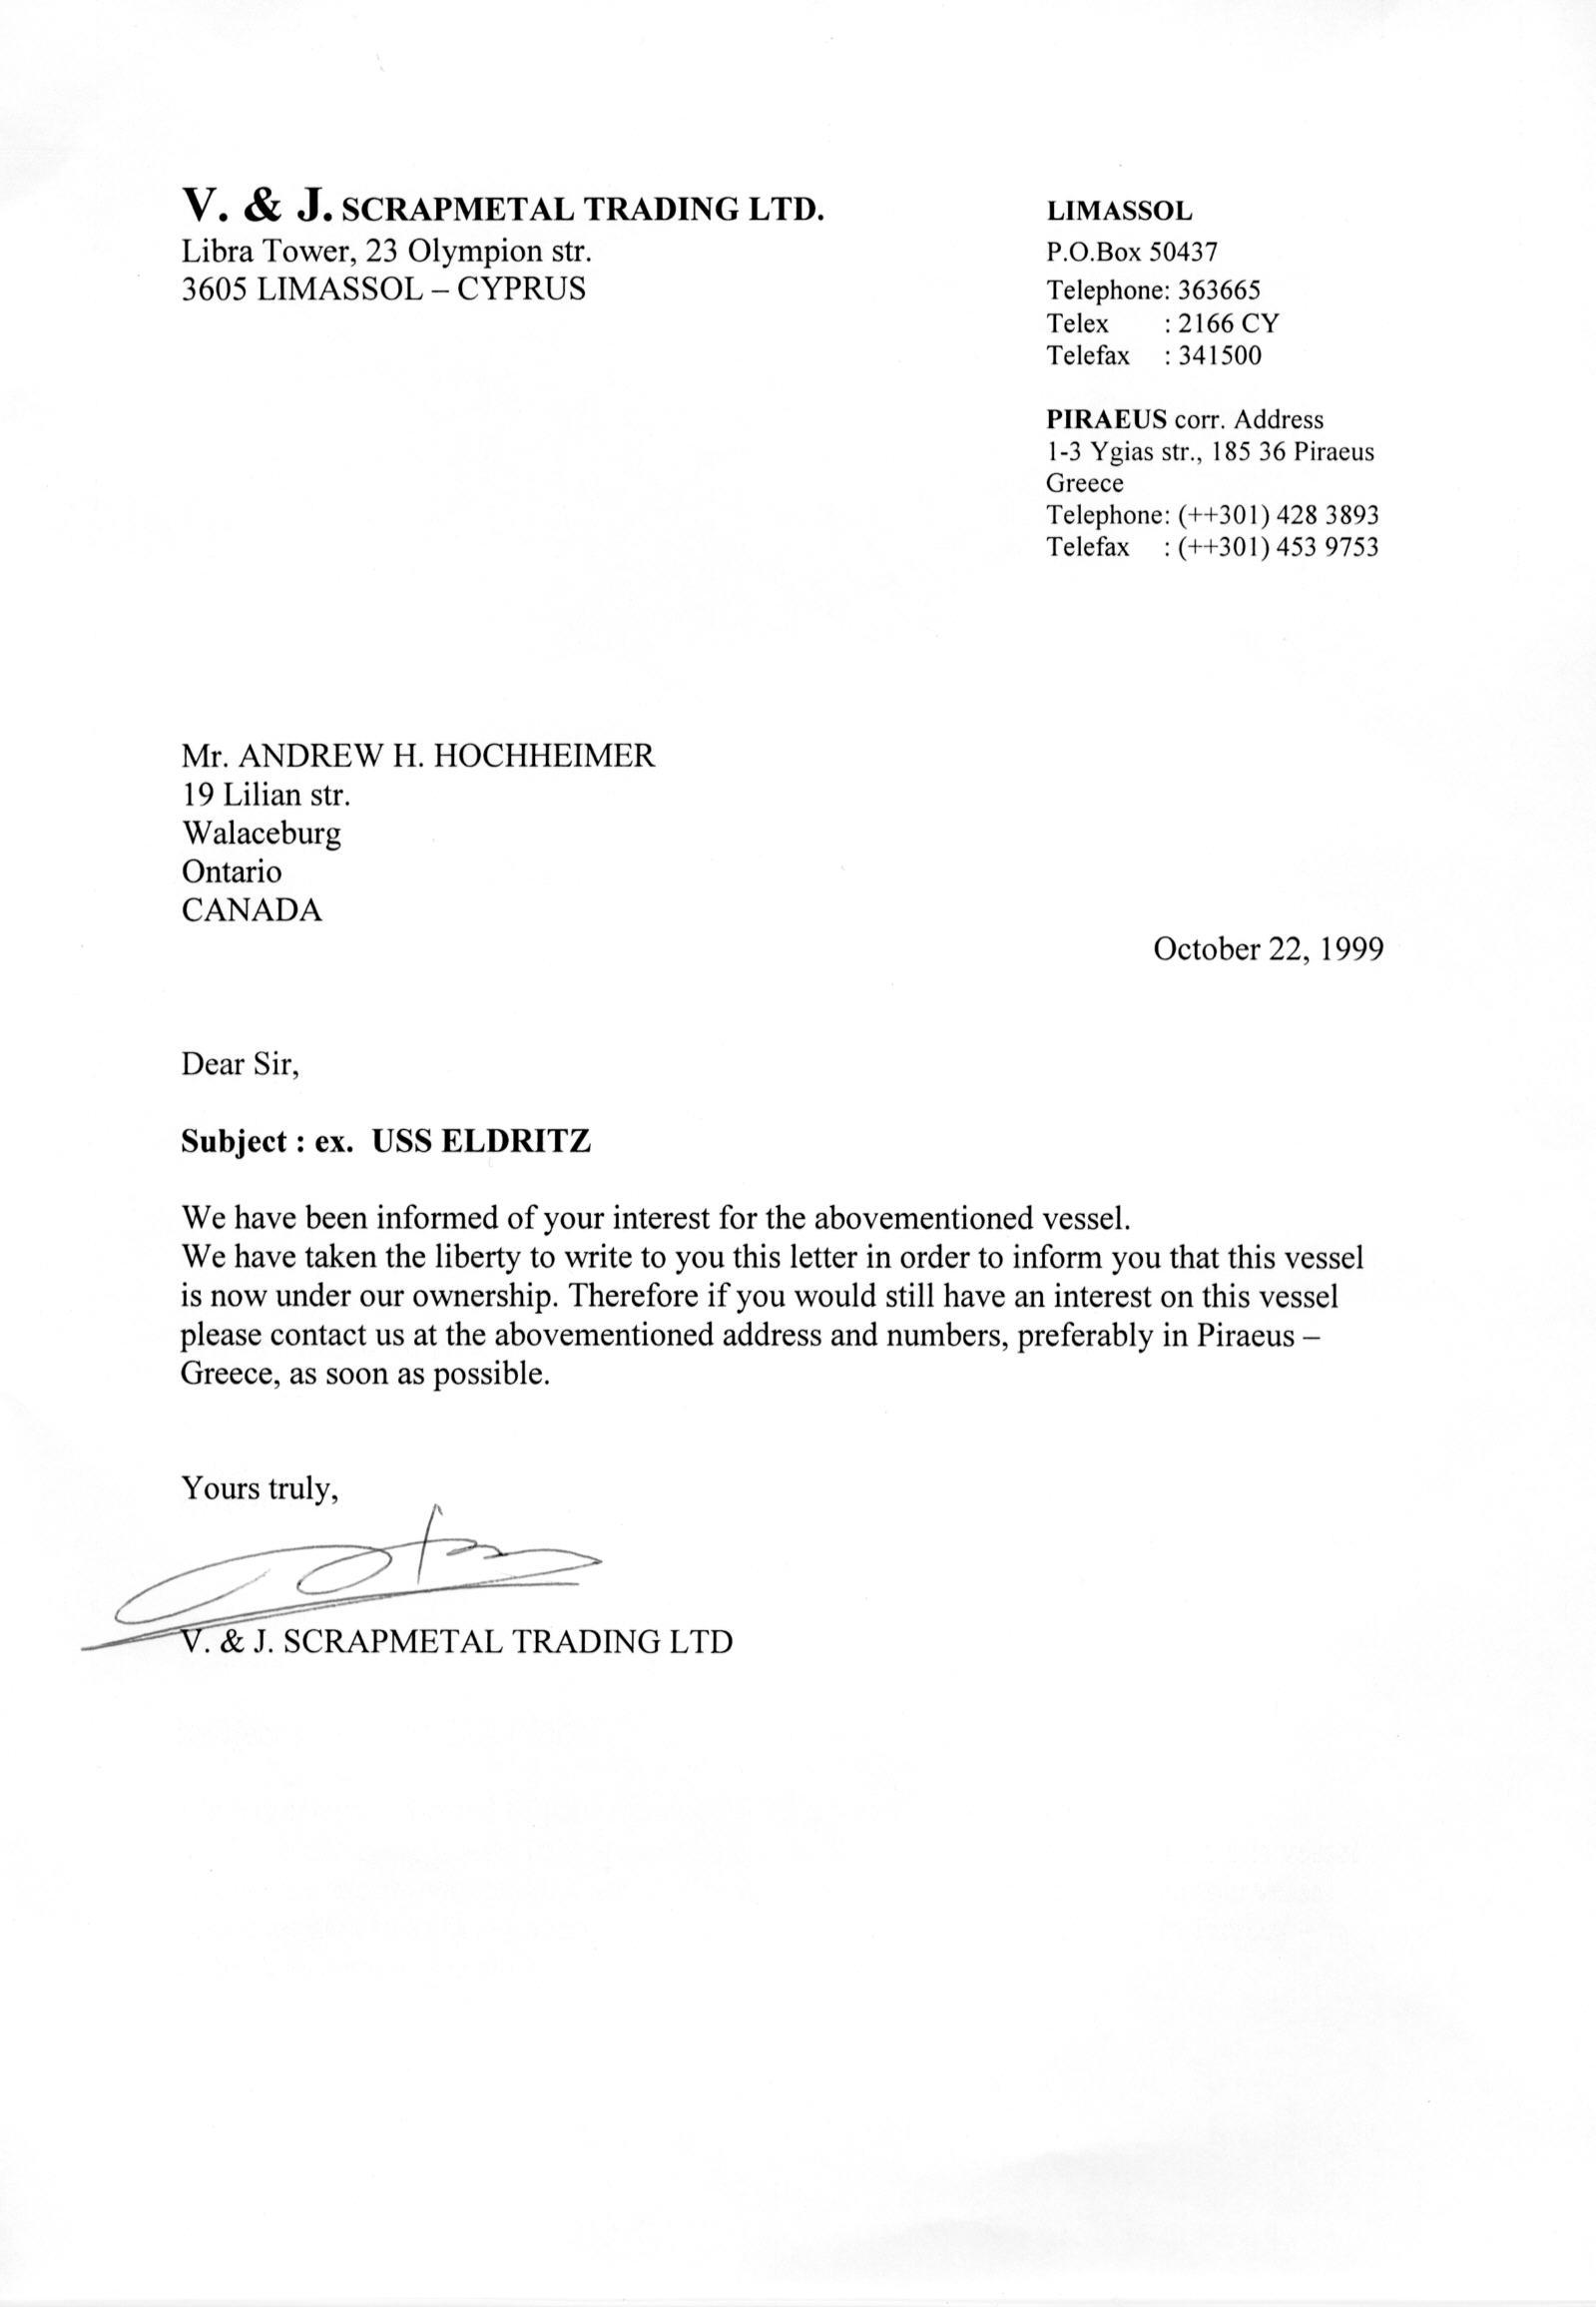 Scrapmetal Trading Ltd, Letter to Andrew Hochheimer, 1999, Oct 22